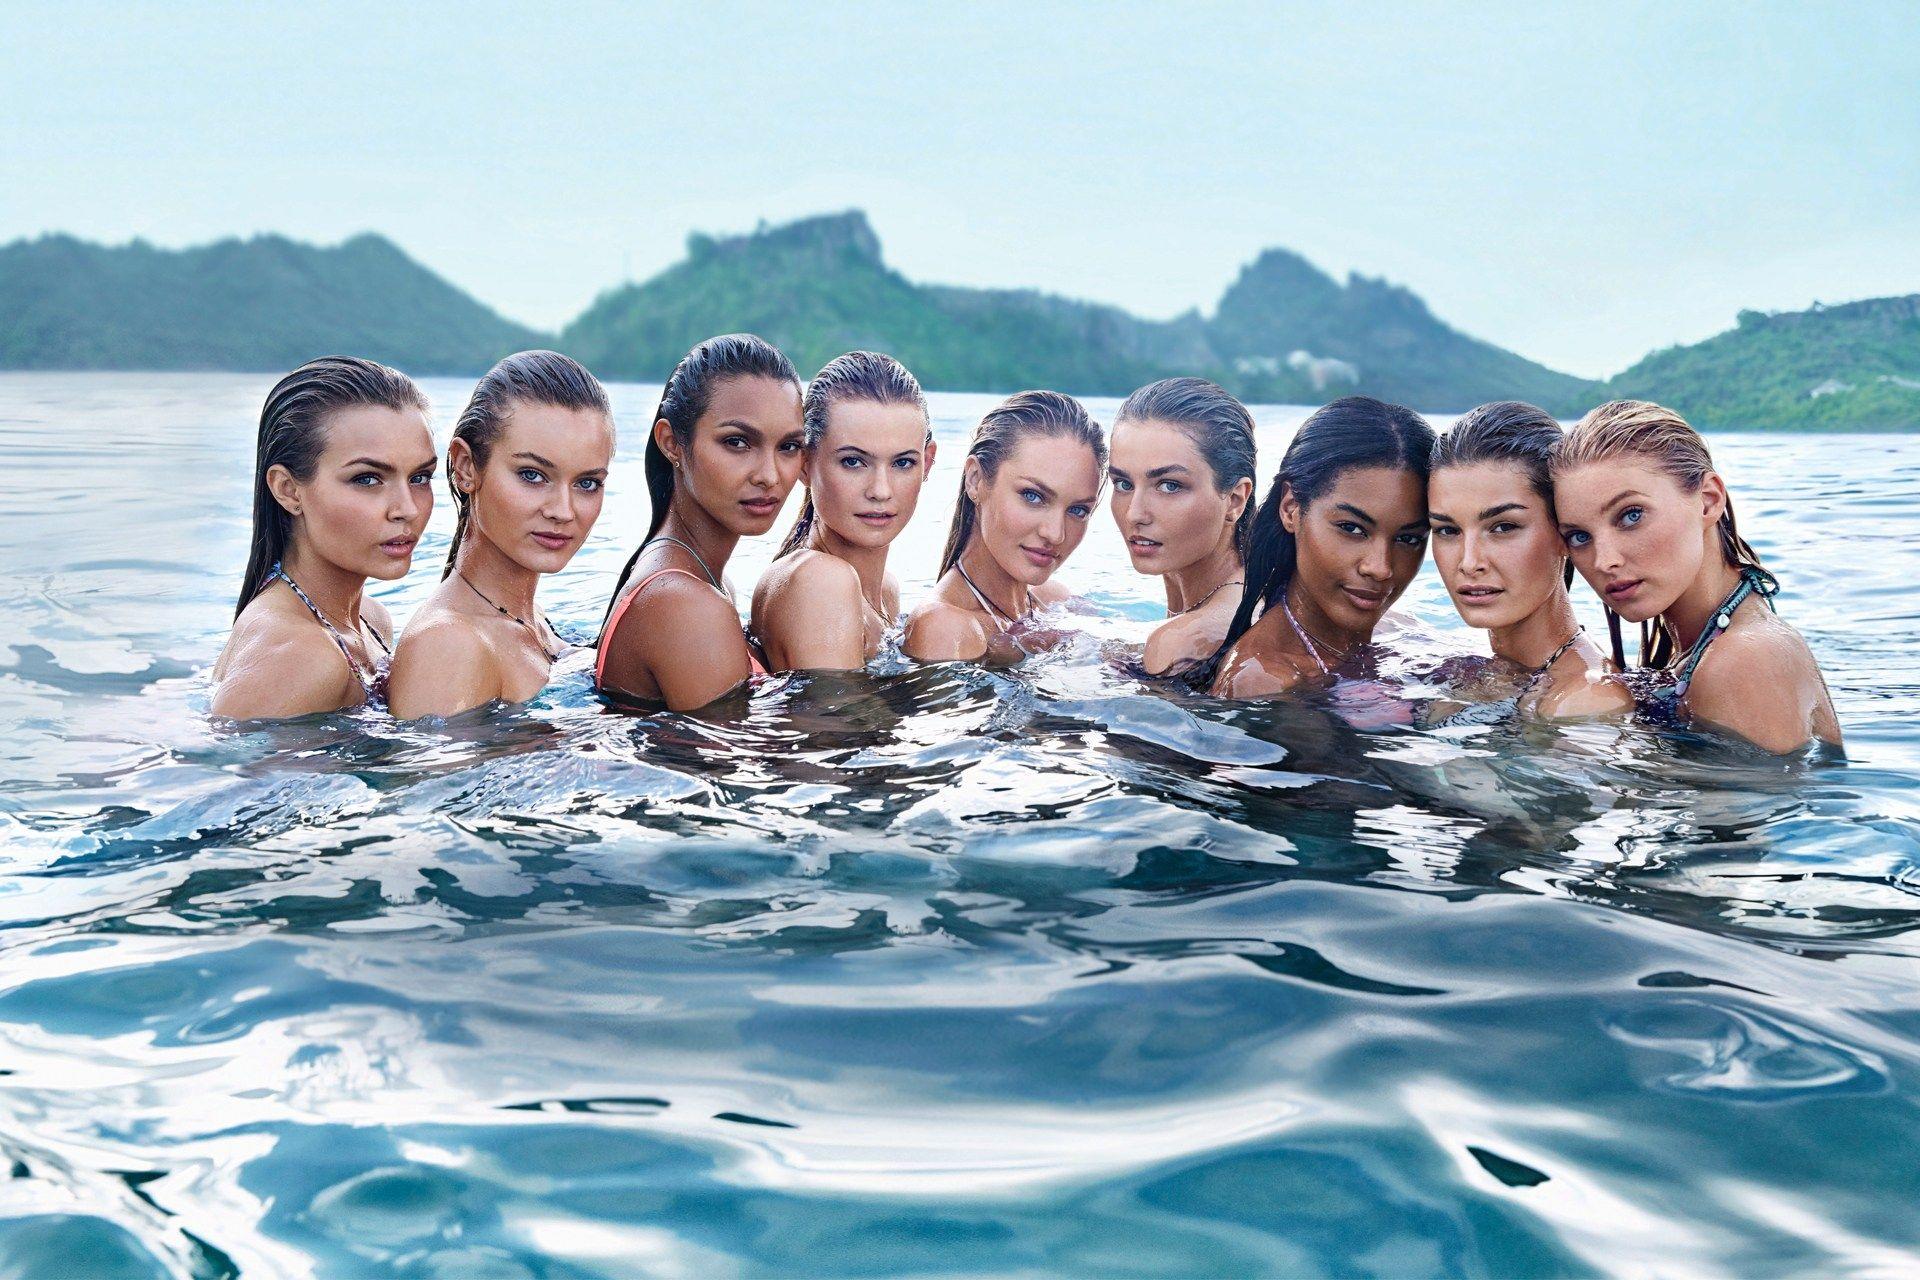 The Victoria's Secret Angels and models